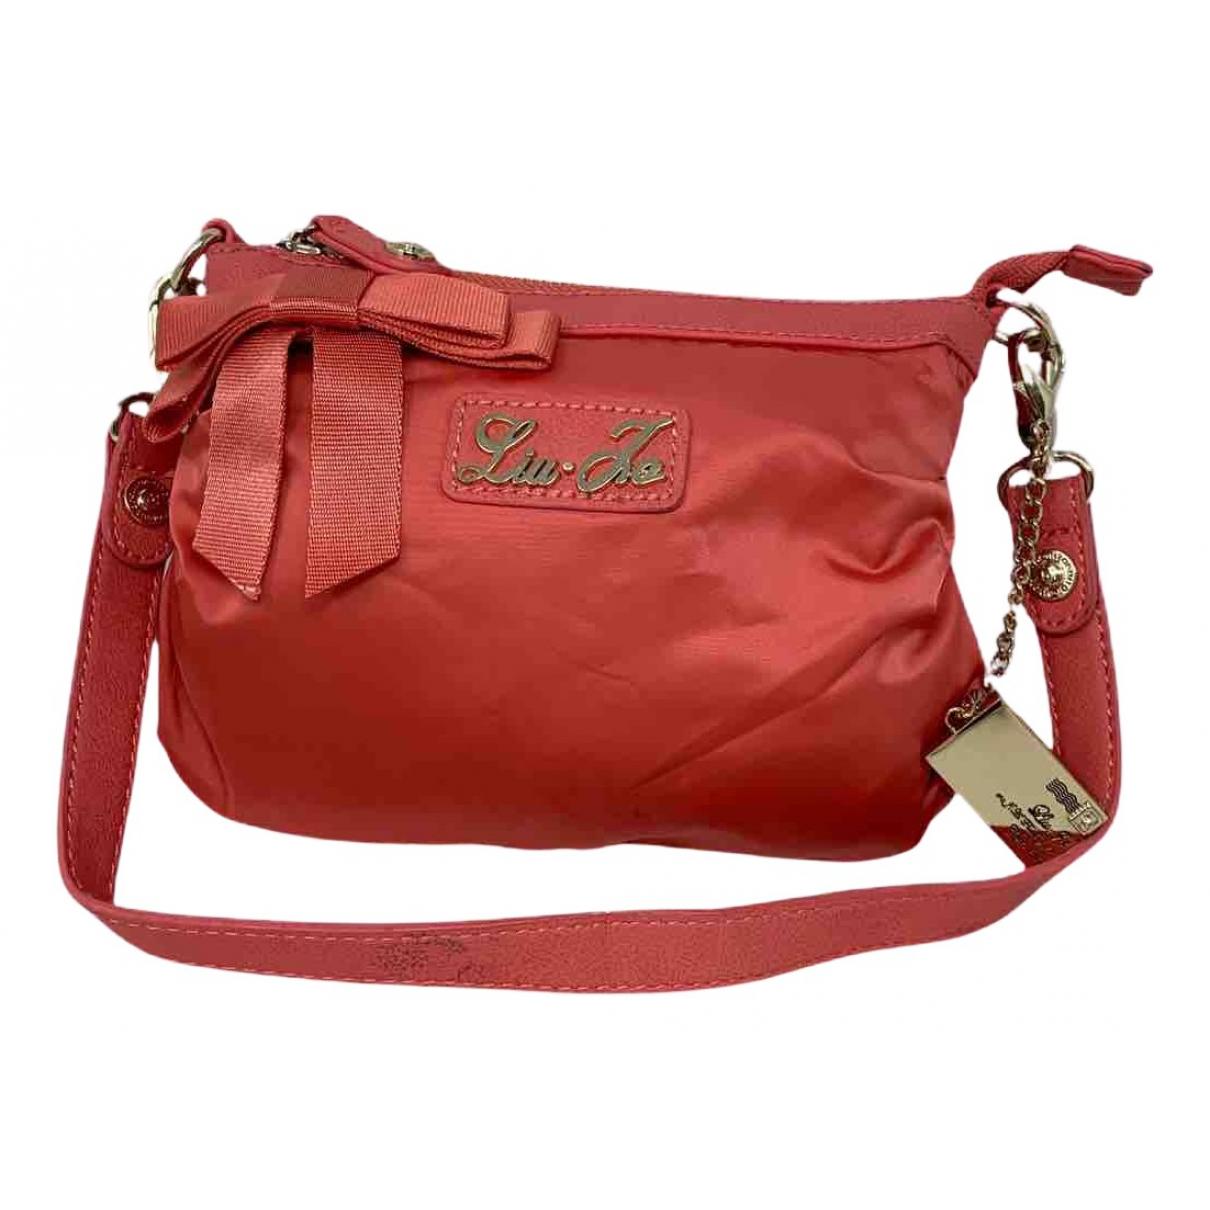 Liu.jo \N Handtasche in  Rosa Leinen